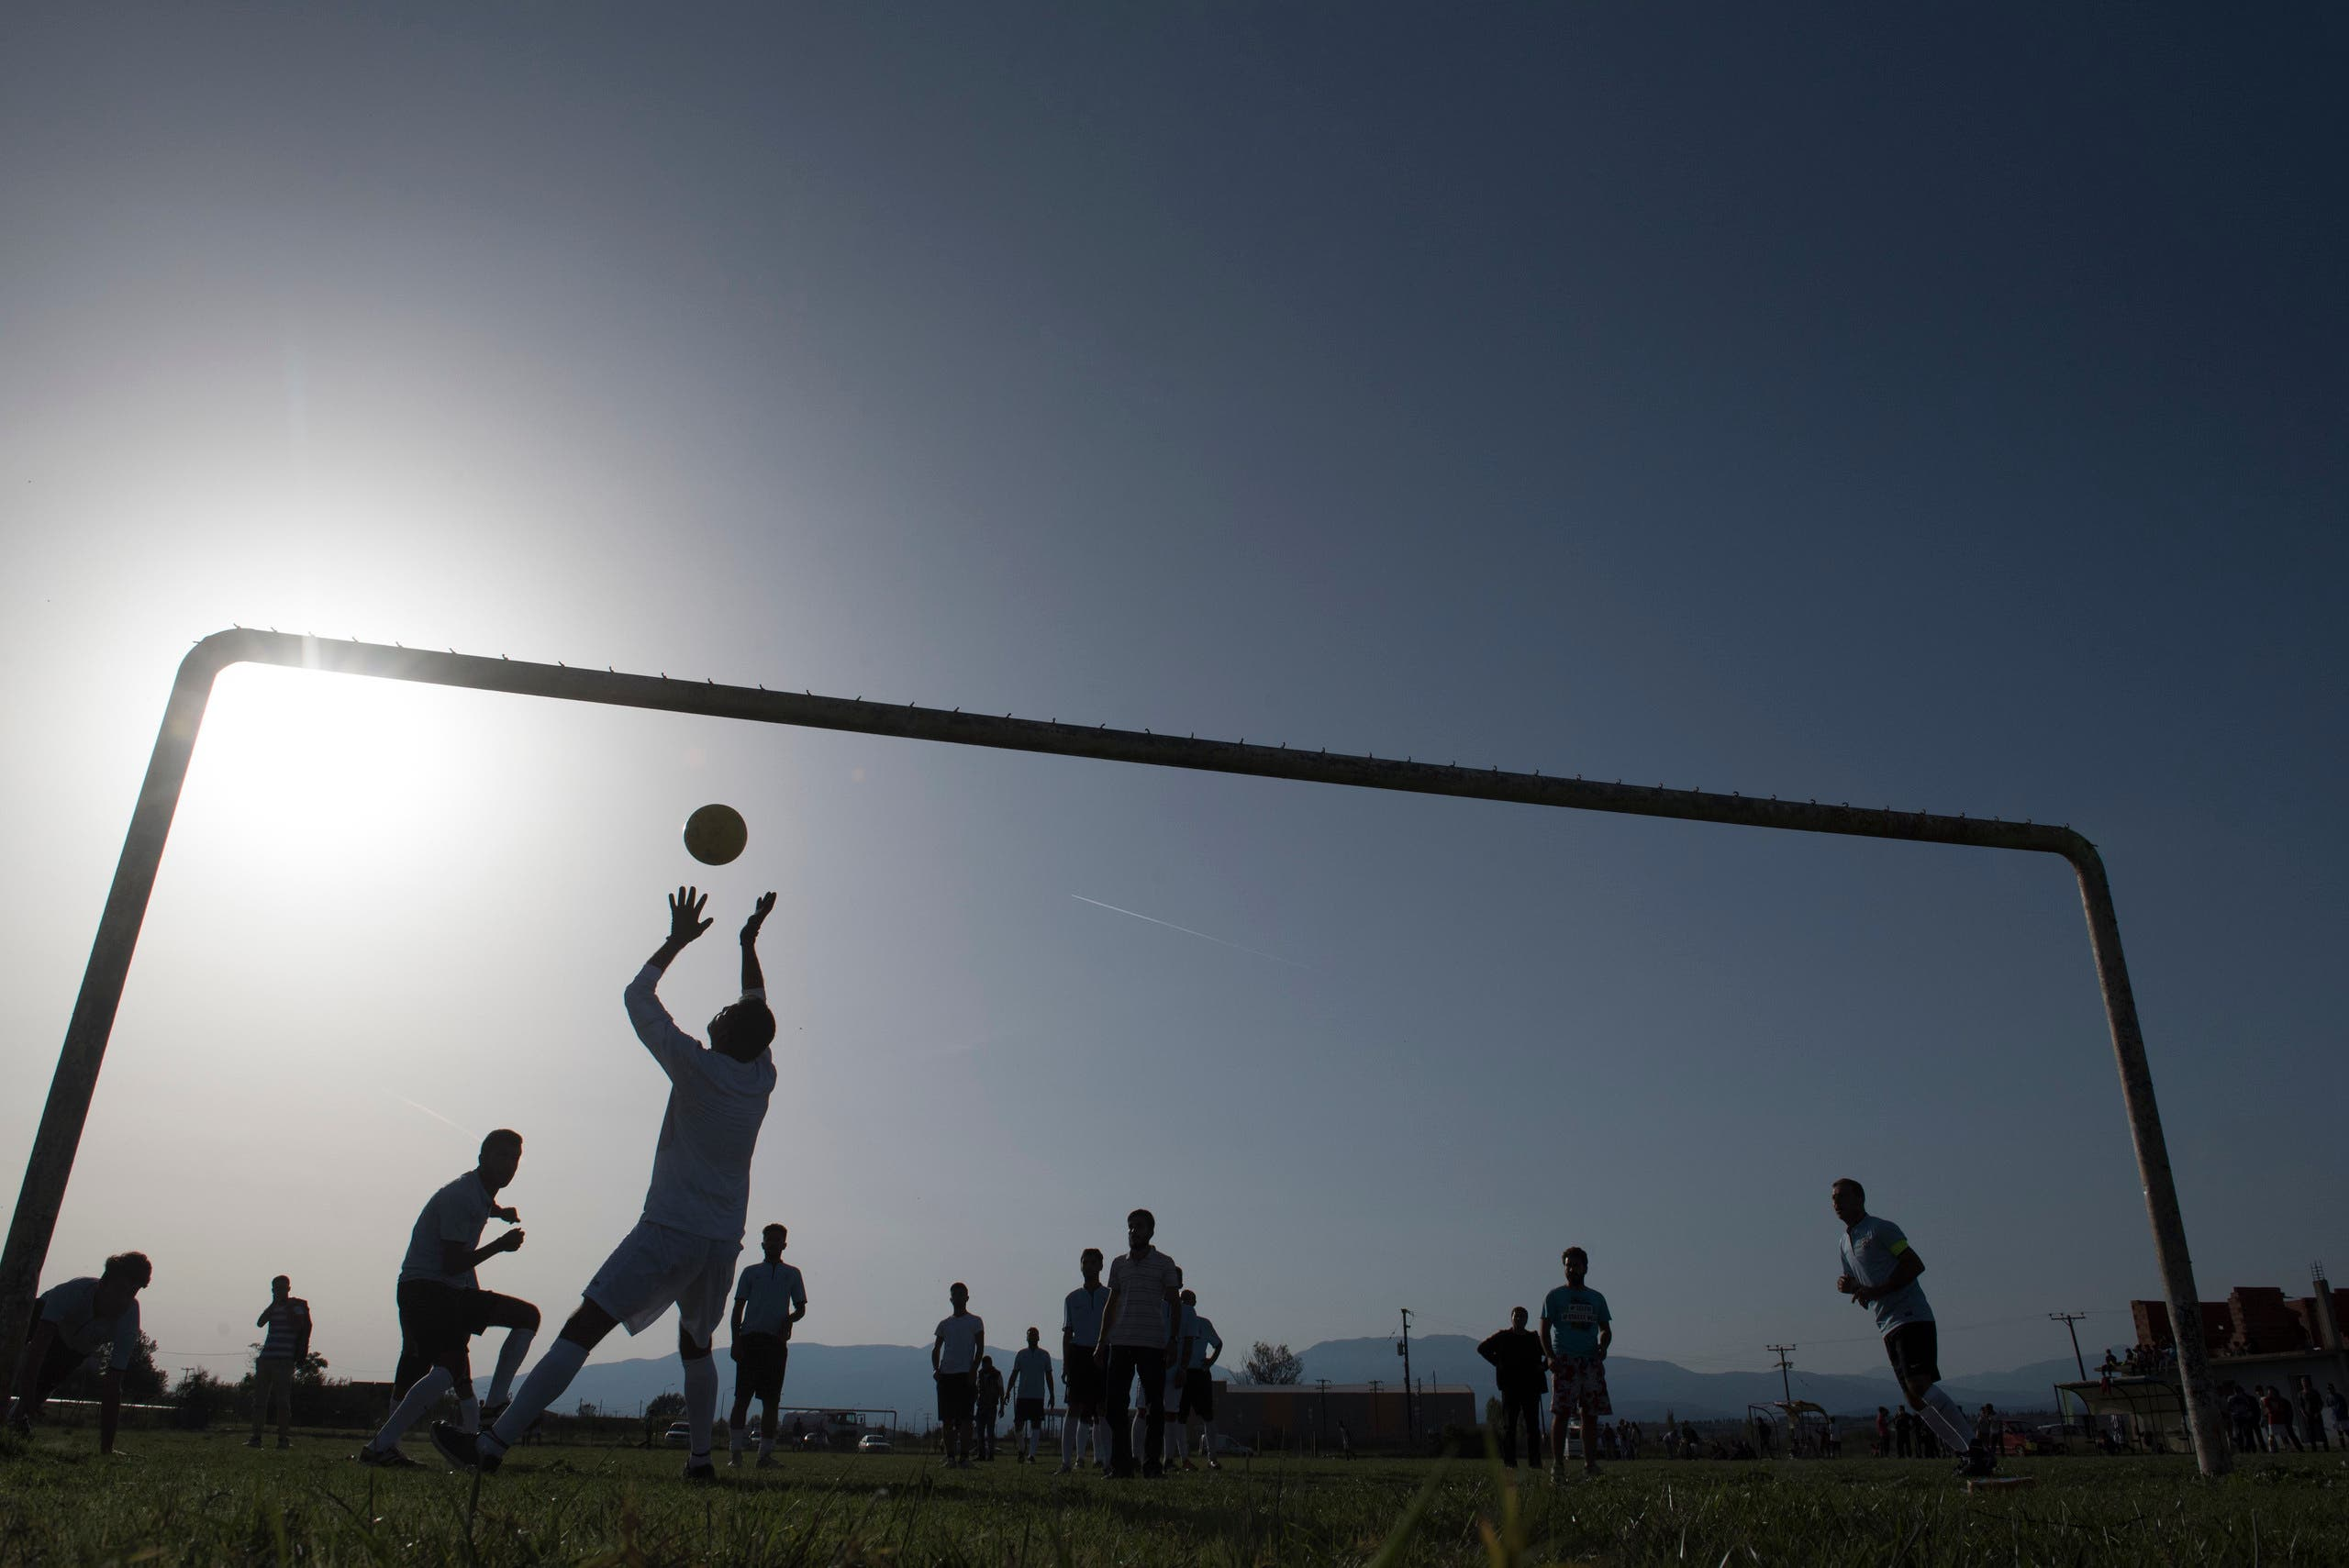 Refugees in Greece take a break, play soccer